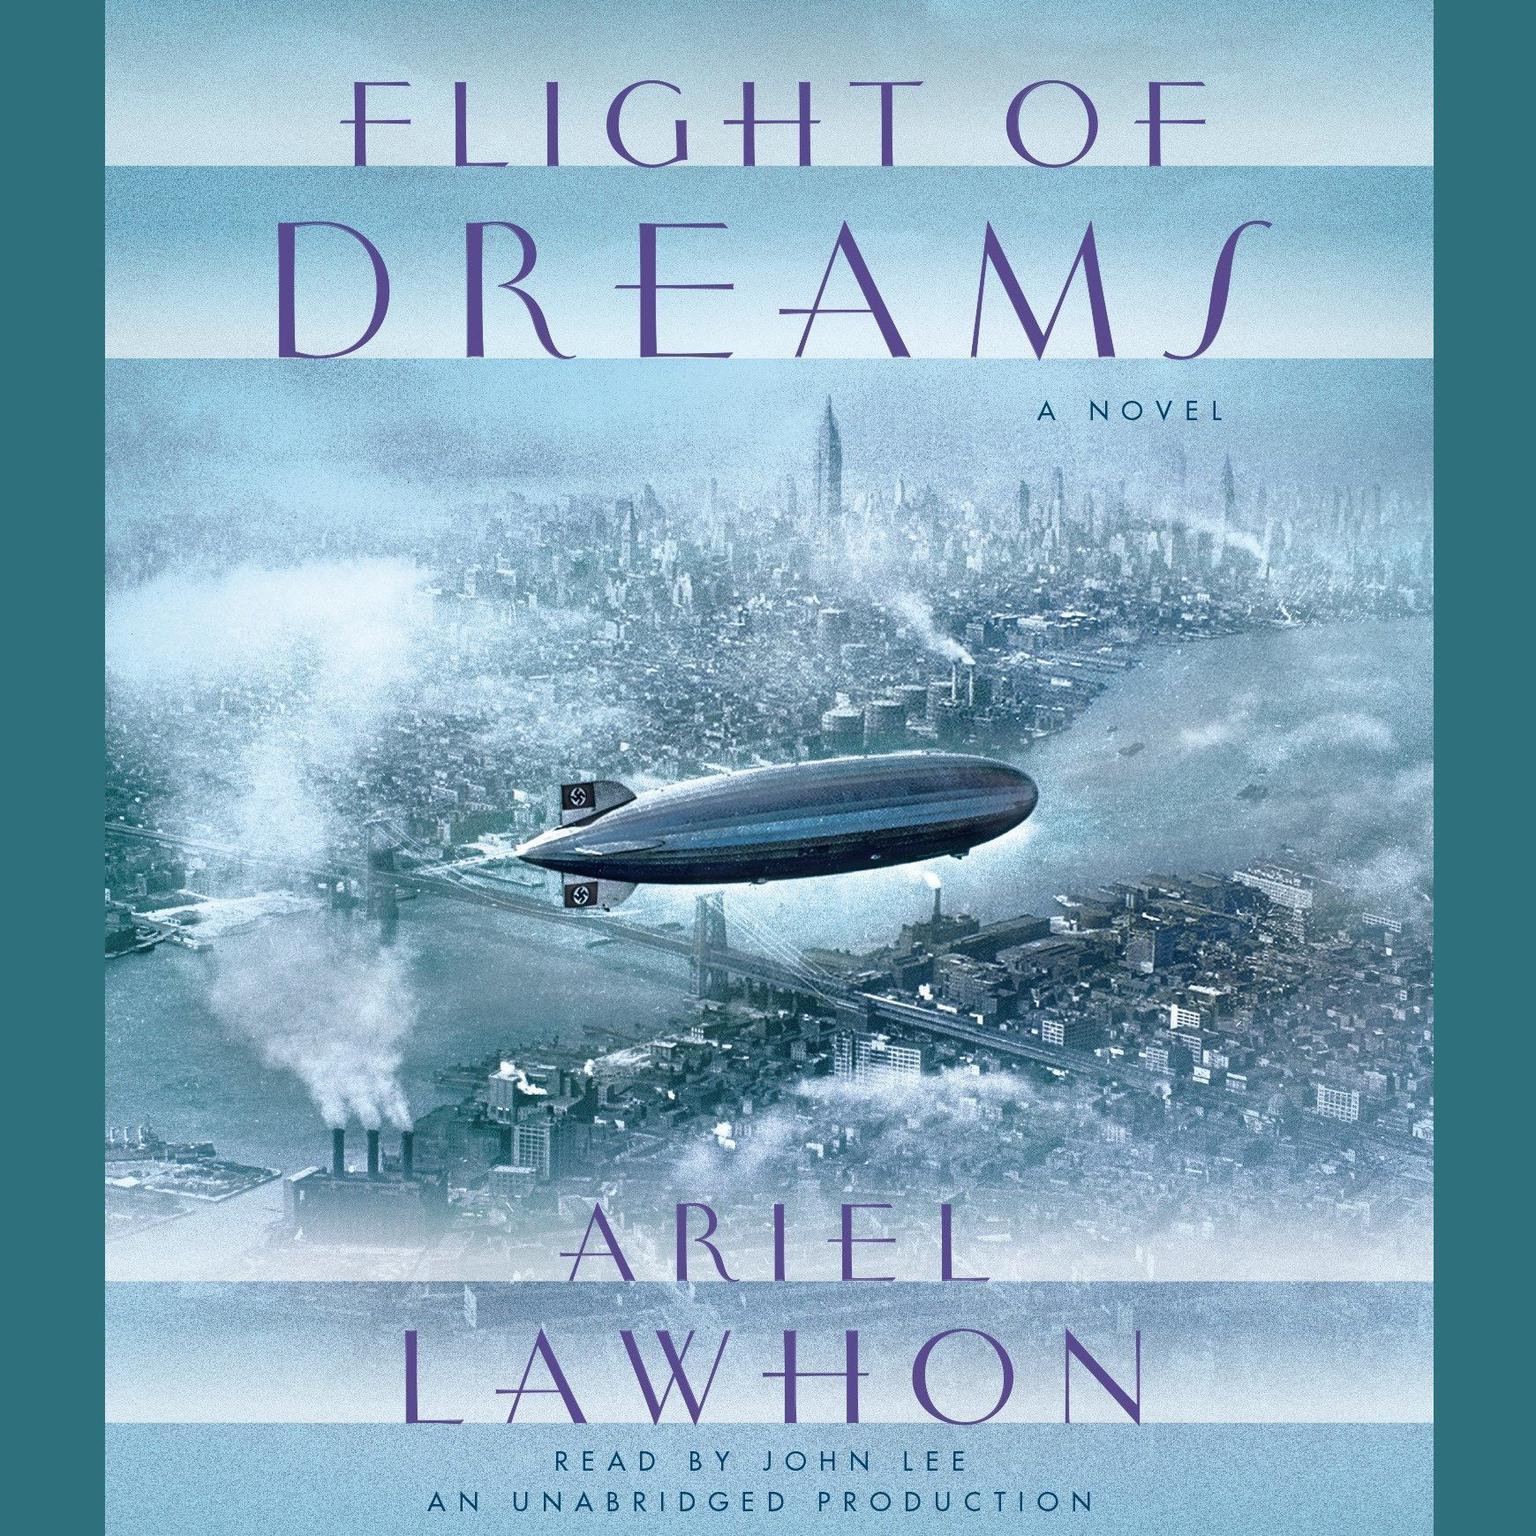 Flight of Dreams: A Novel Audiobook, by Ariel Lawhon